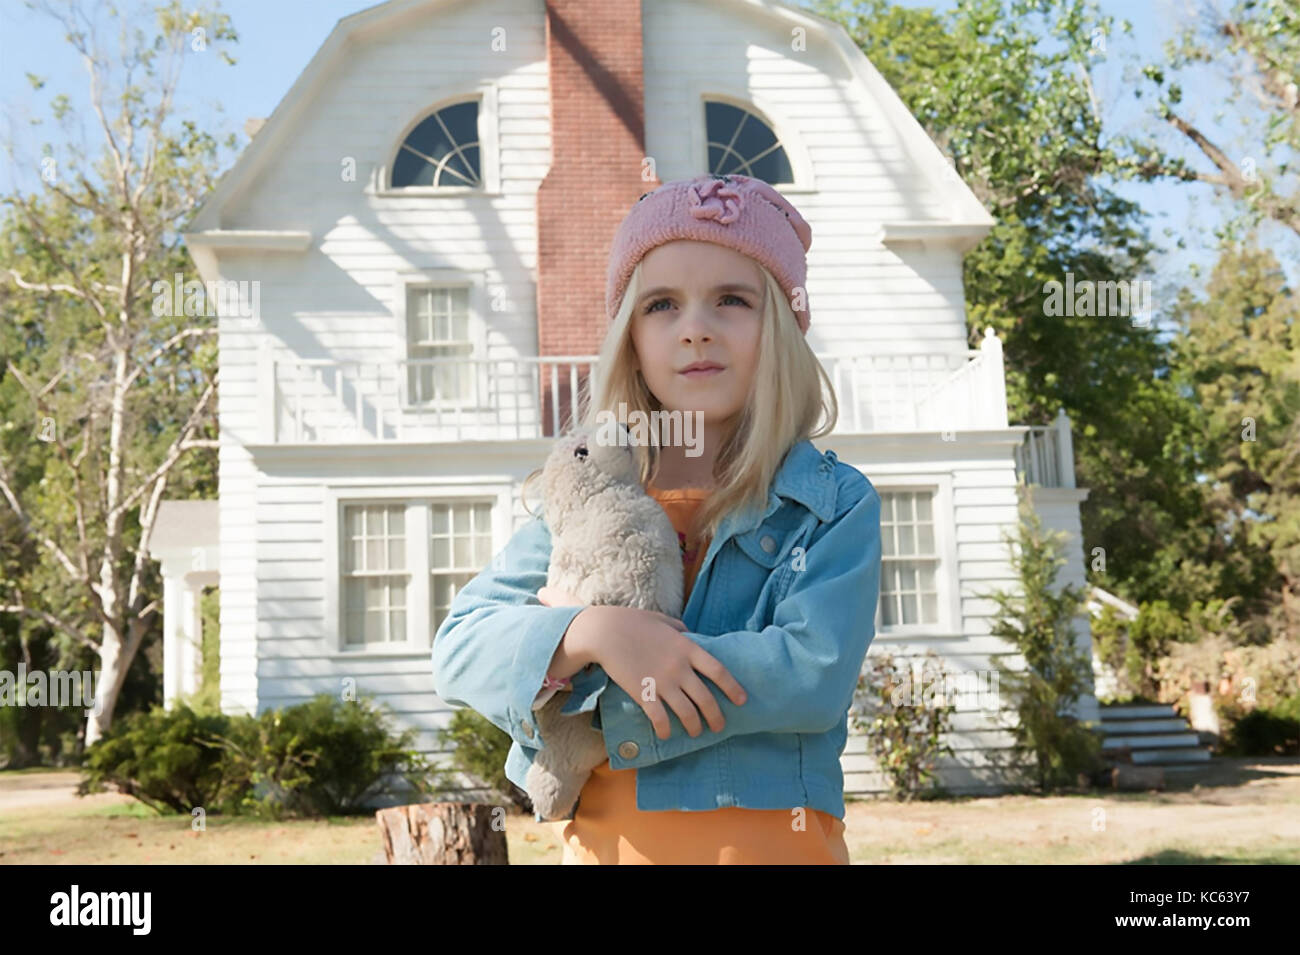 AMITYVILLE; THE AWAKENING 2017 Blumhouse Productions film with Mckenna Grace - Stock Image